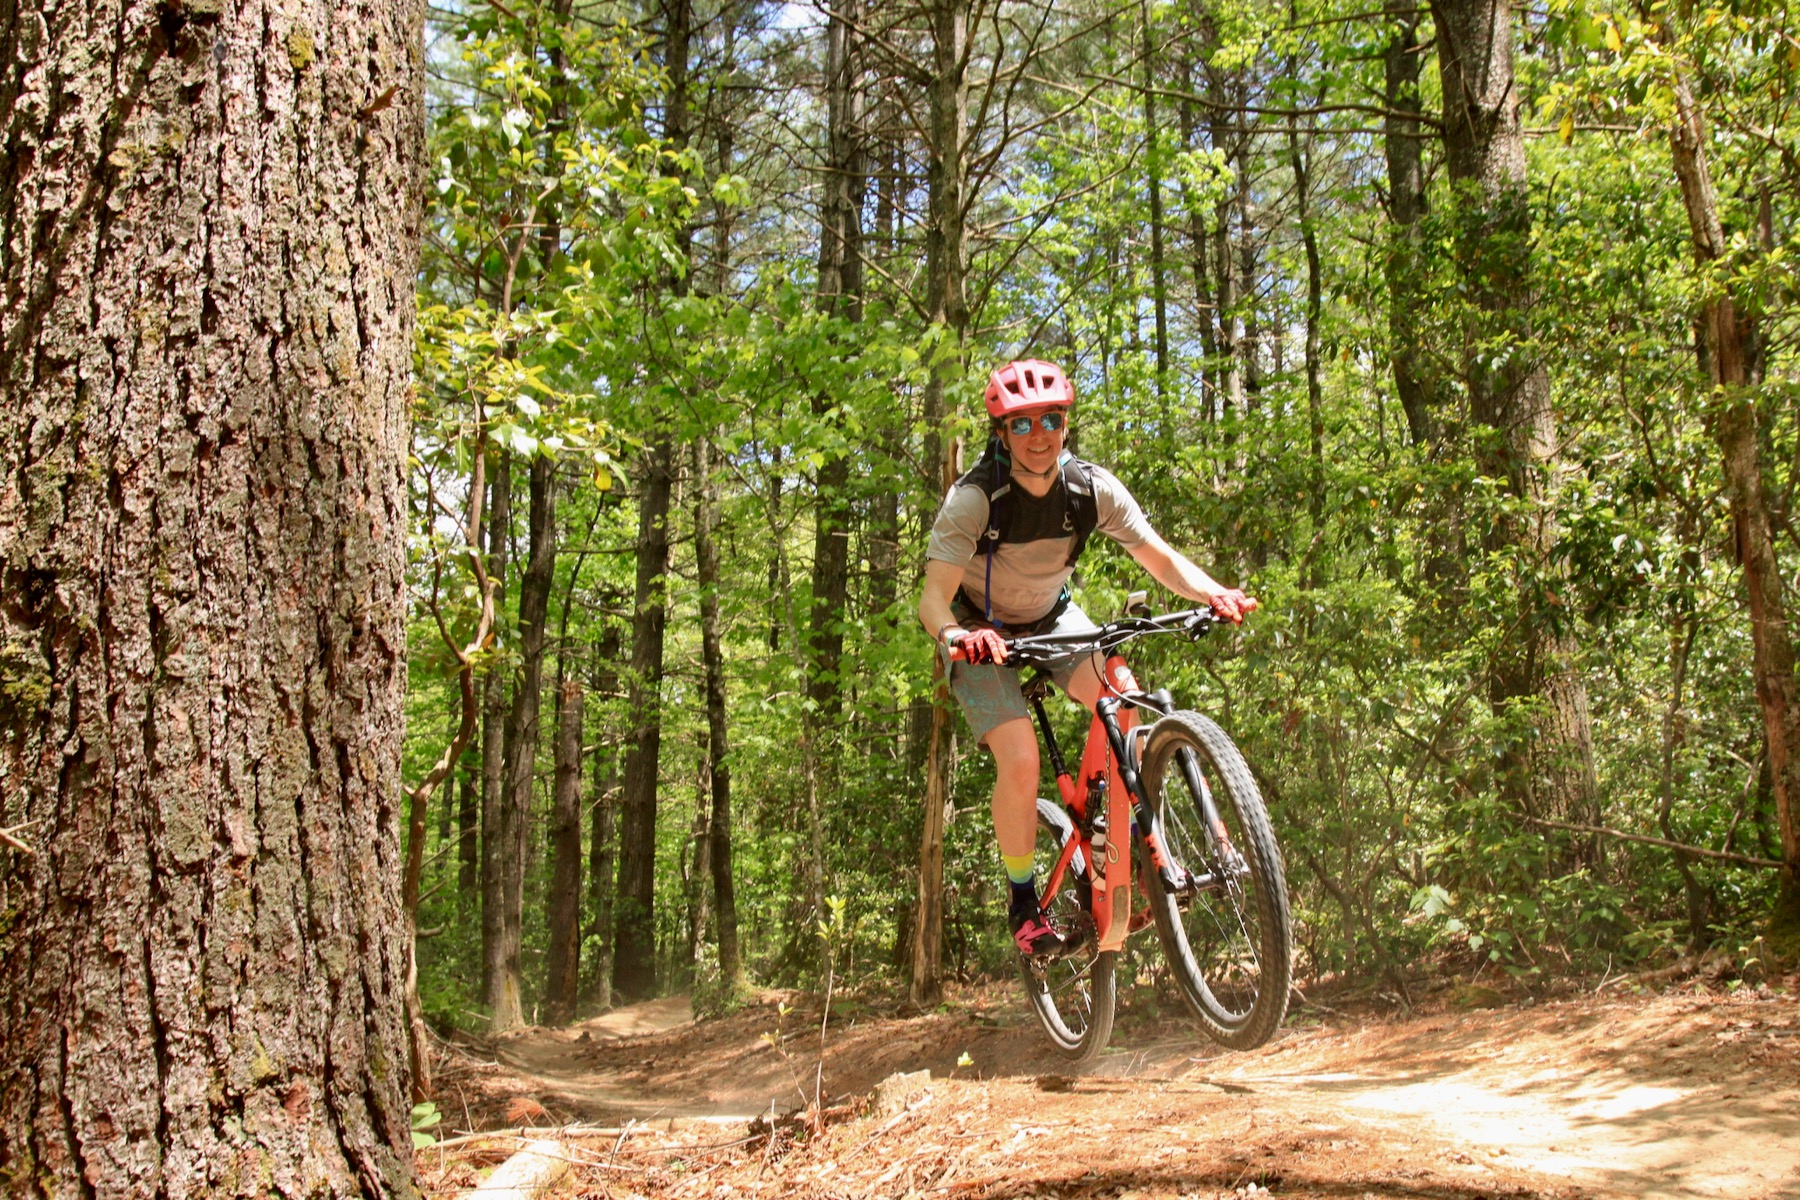 Who Got You Into Mountain Biking? - Singletracks Mountain Bike News